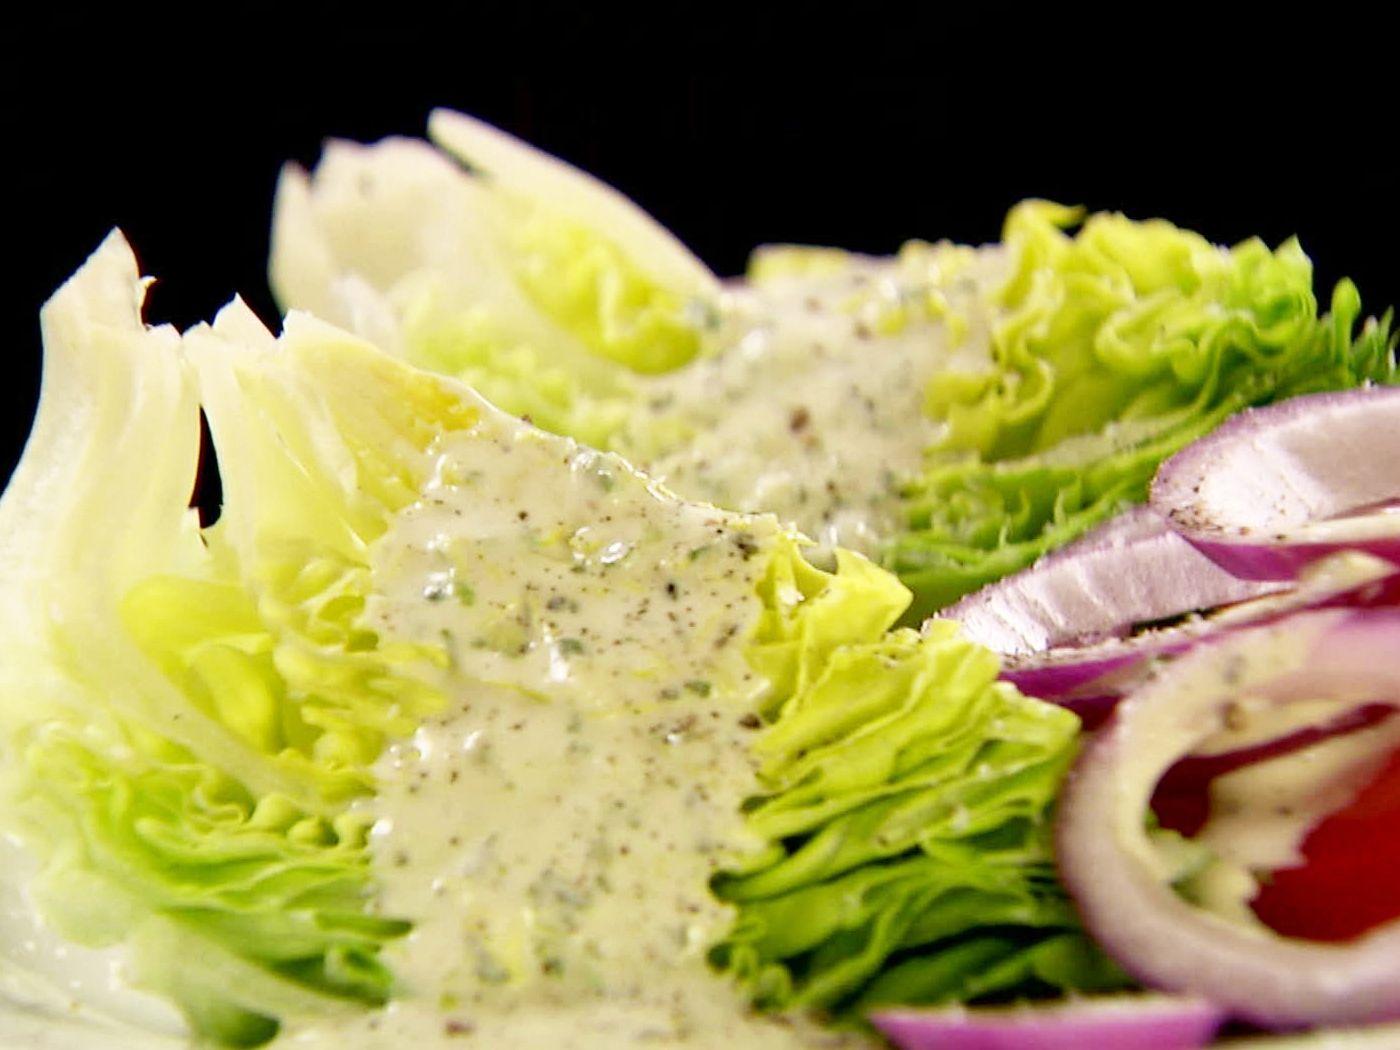 Buttermilk Ranch Dressing With Bibb Lettuce Recipe Buttermilk Ranch Dressing Lettuce Recipes Bibb Lettuce Recipe